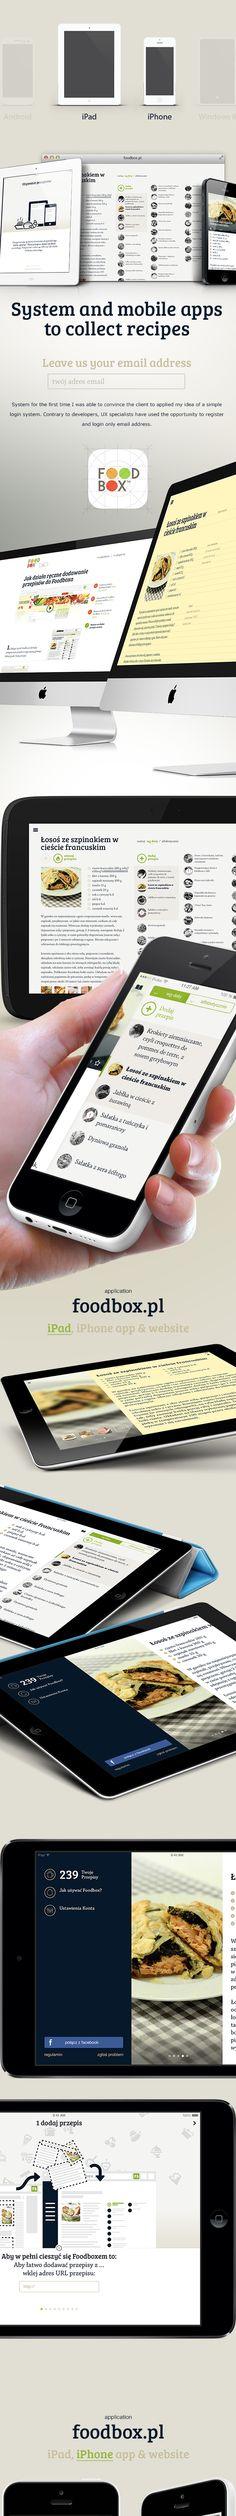 foodbox app on Behance